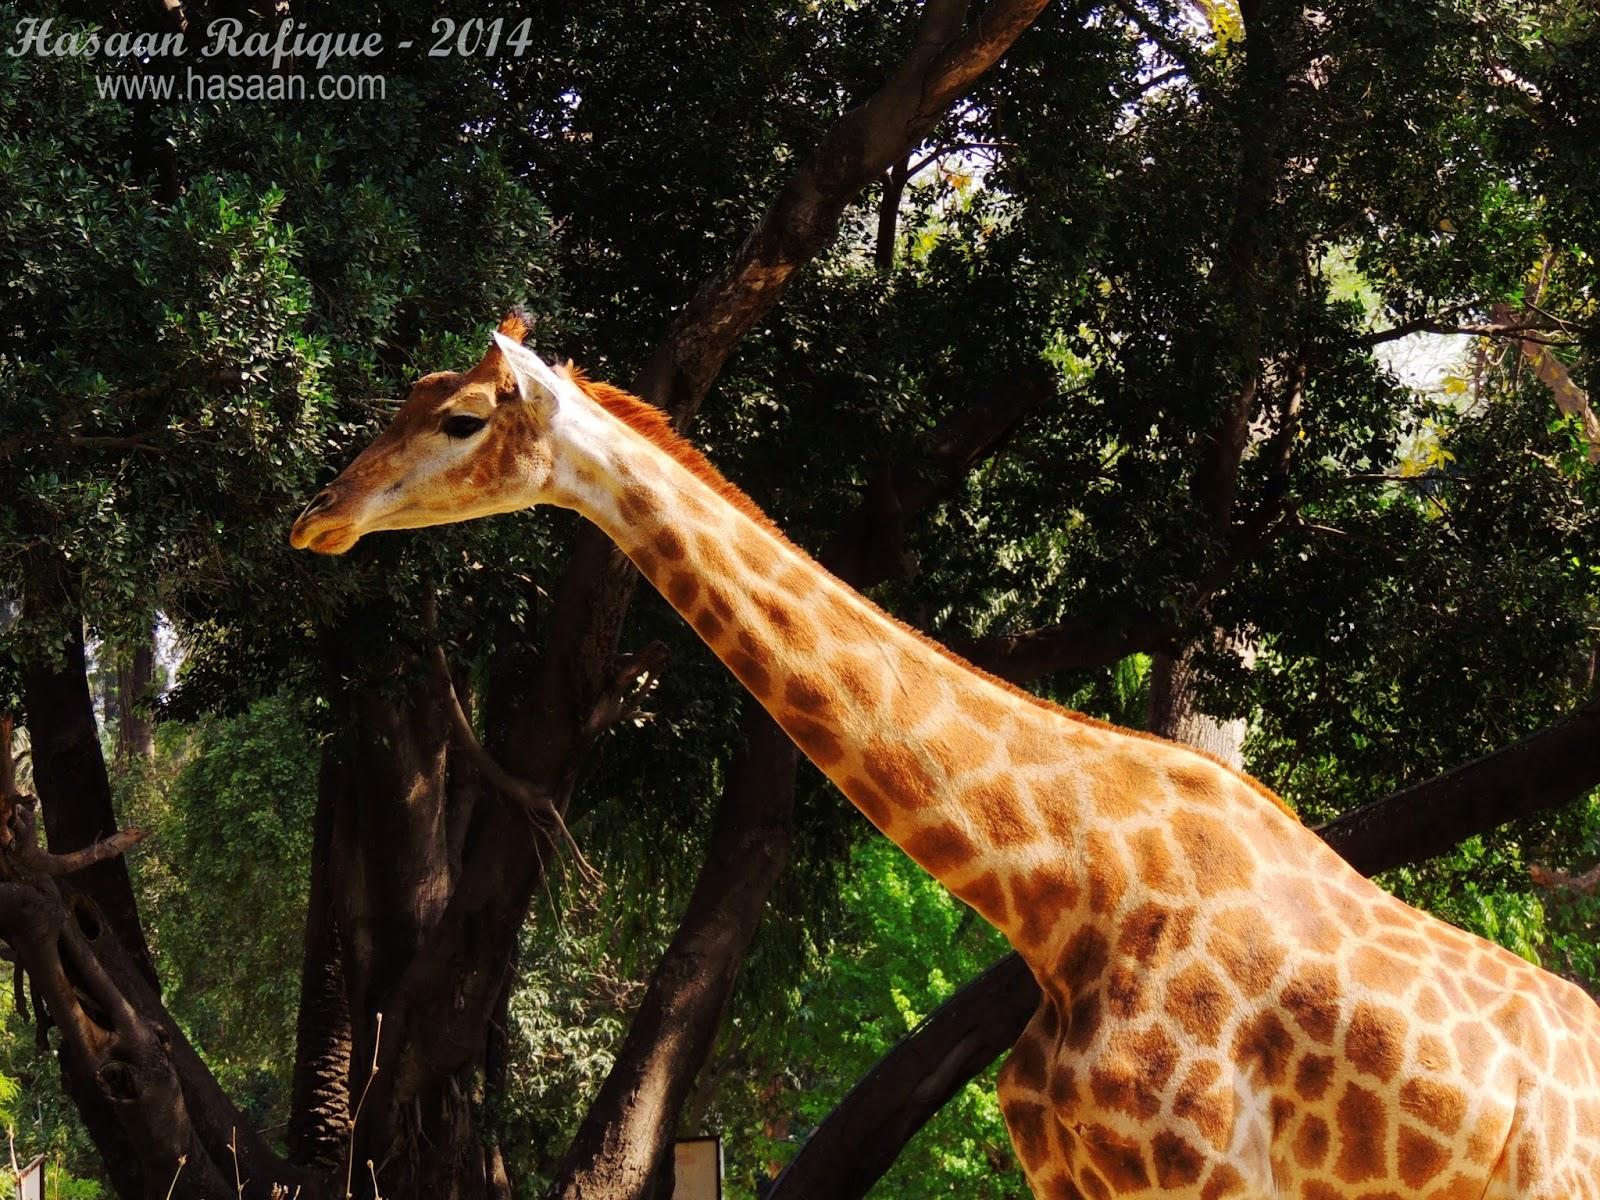 A towering giraffe.